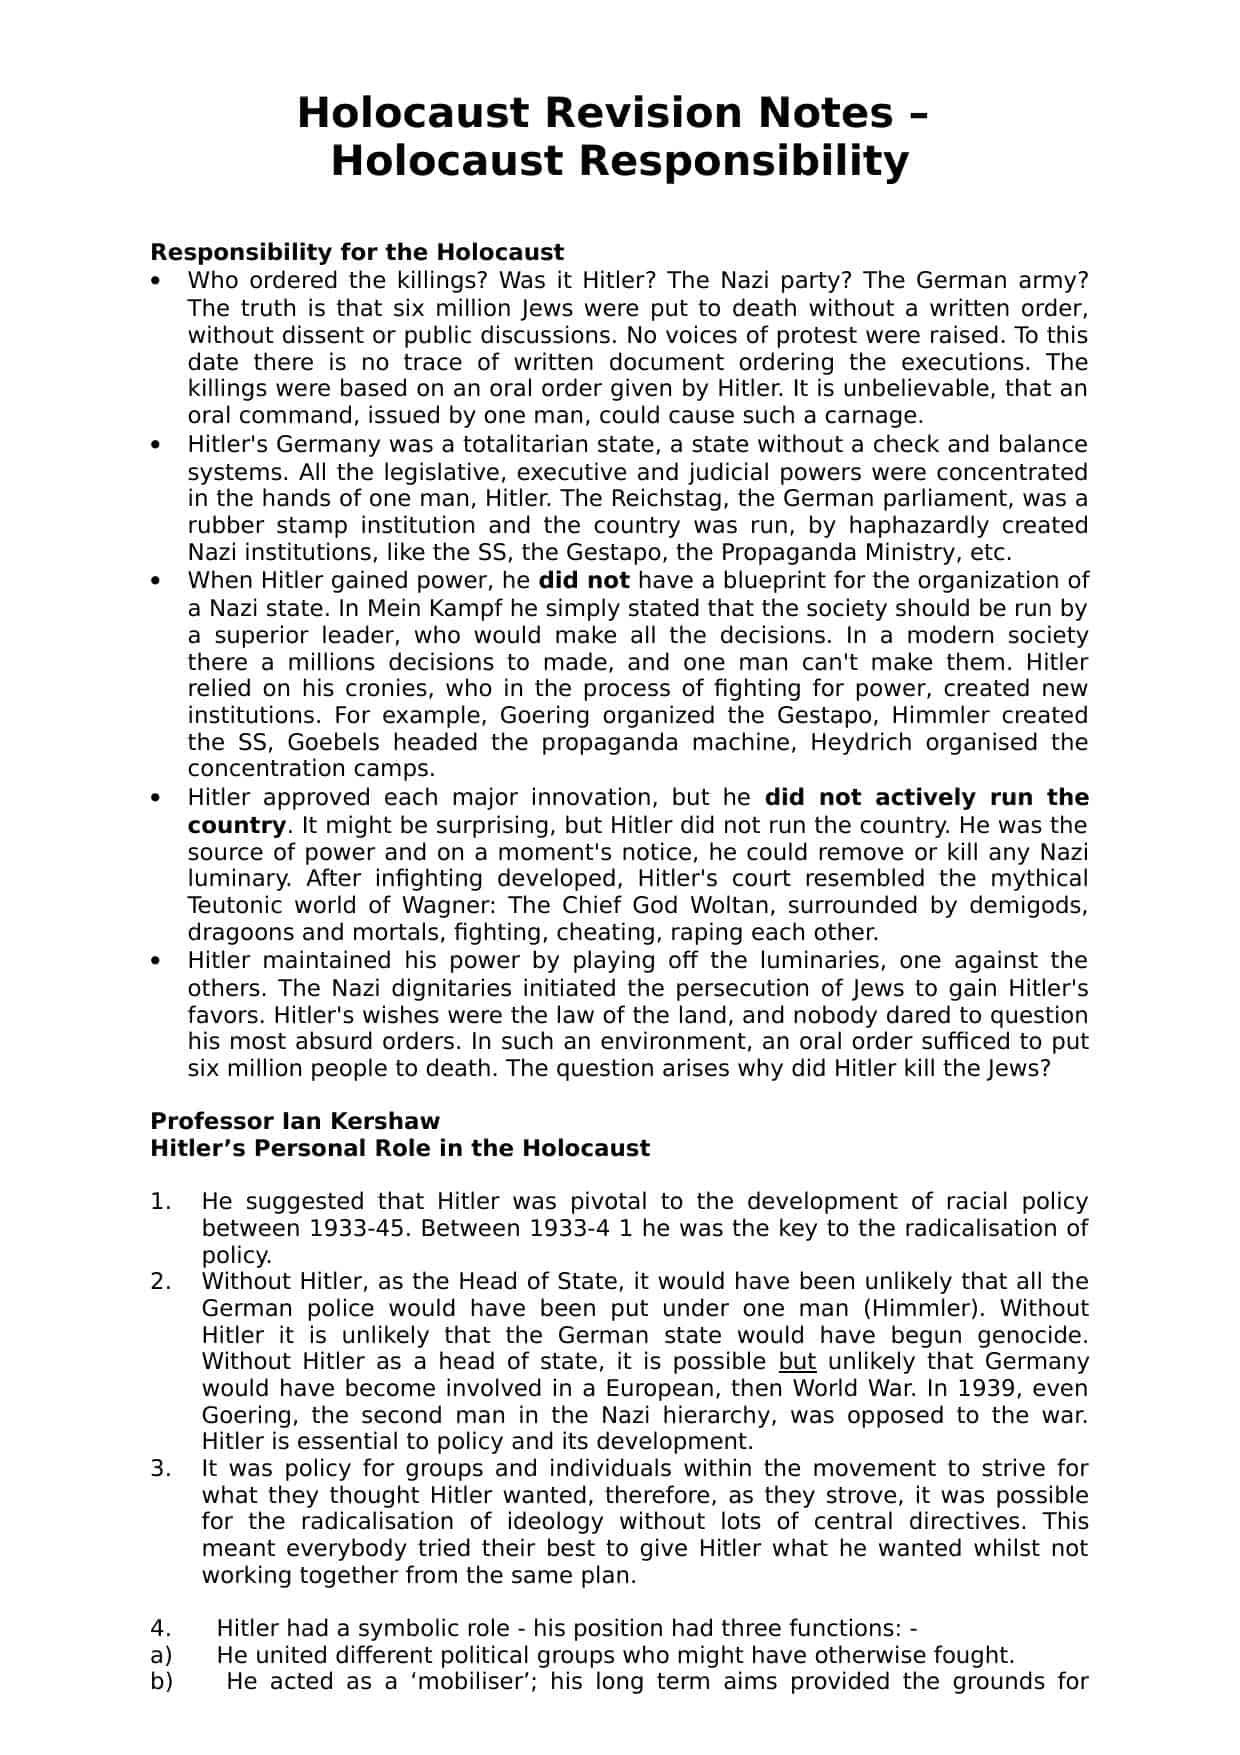 Holocaust Responsibility Revision Worksheet